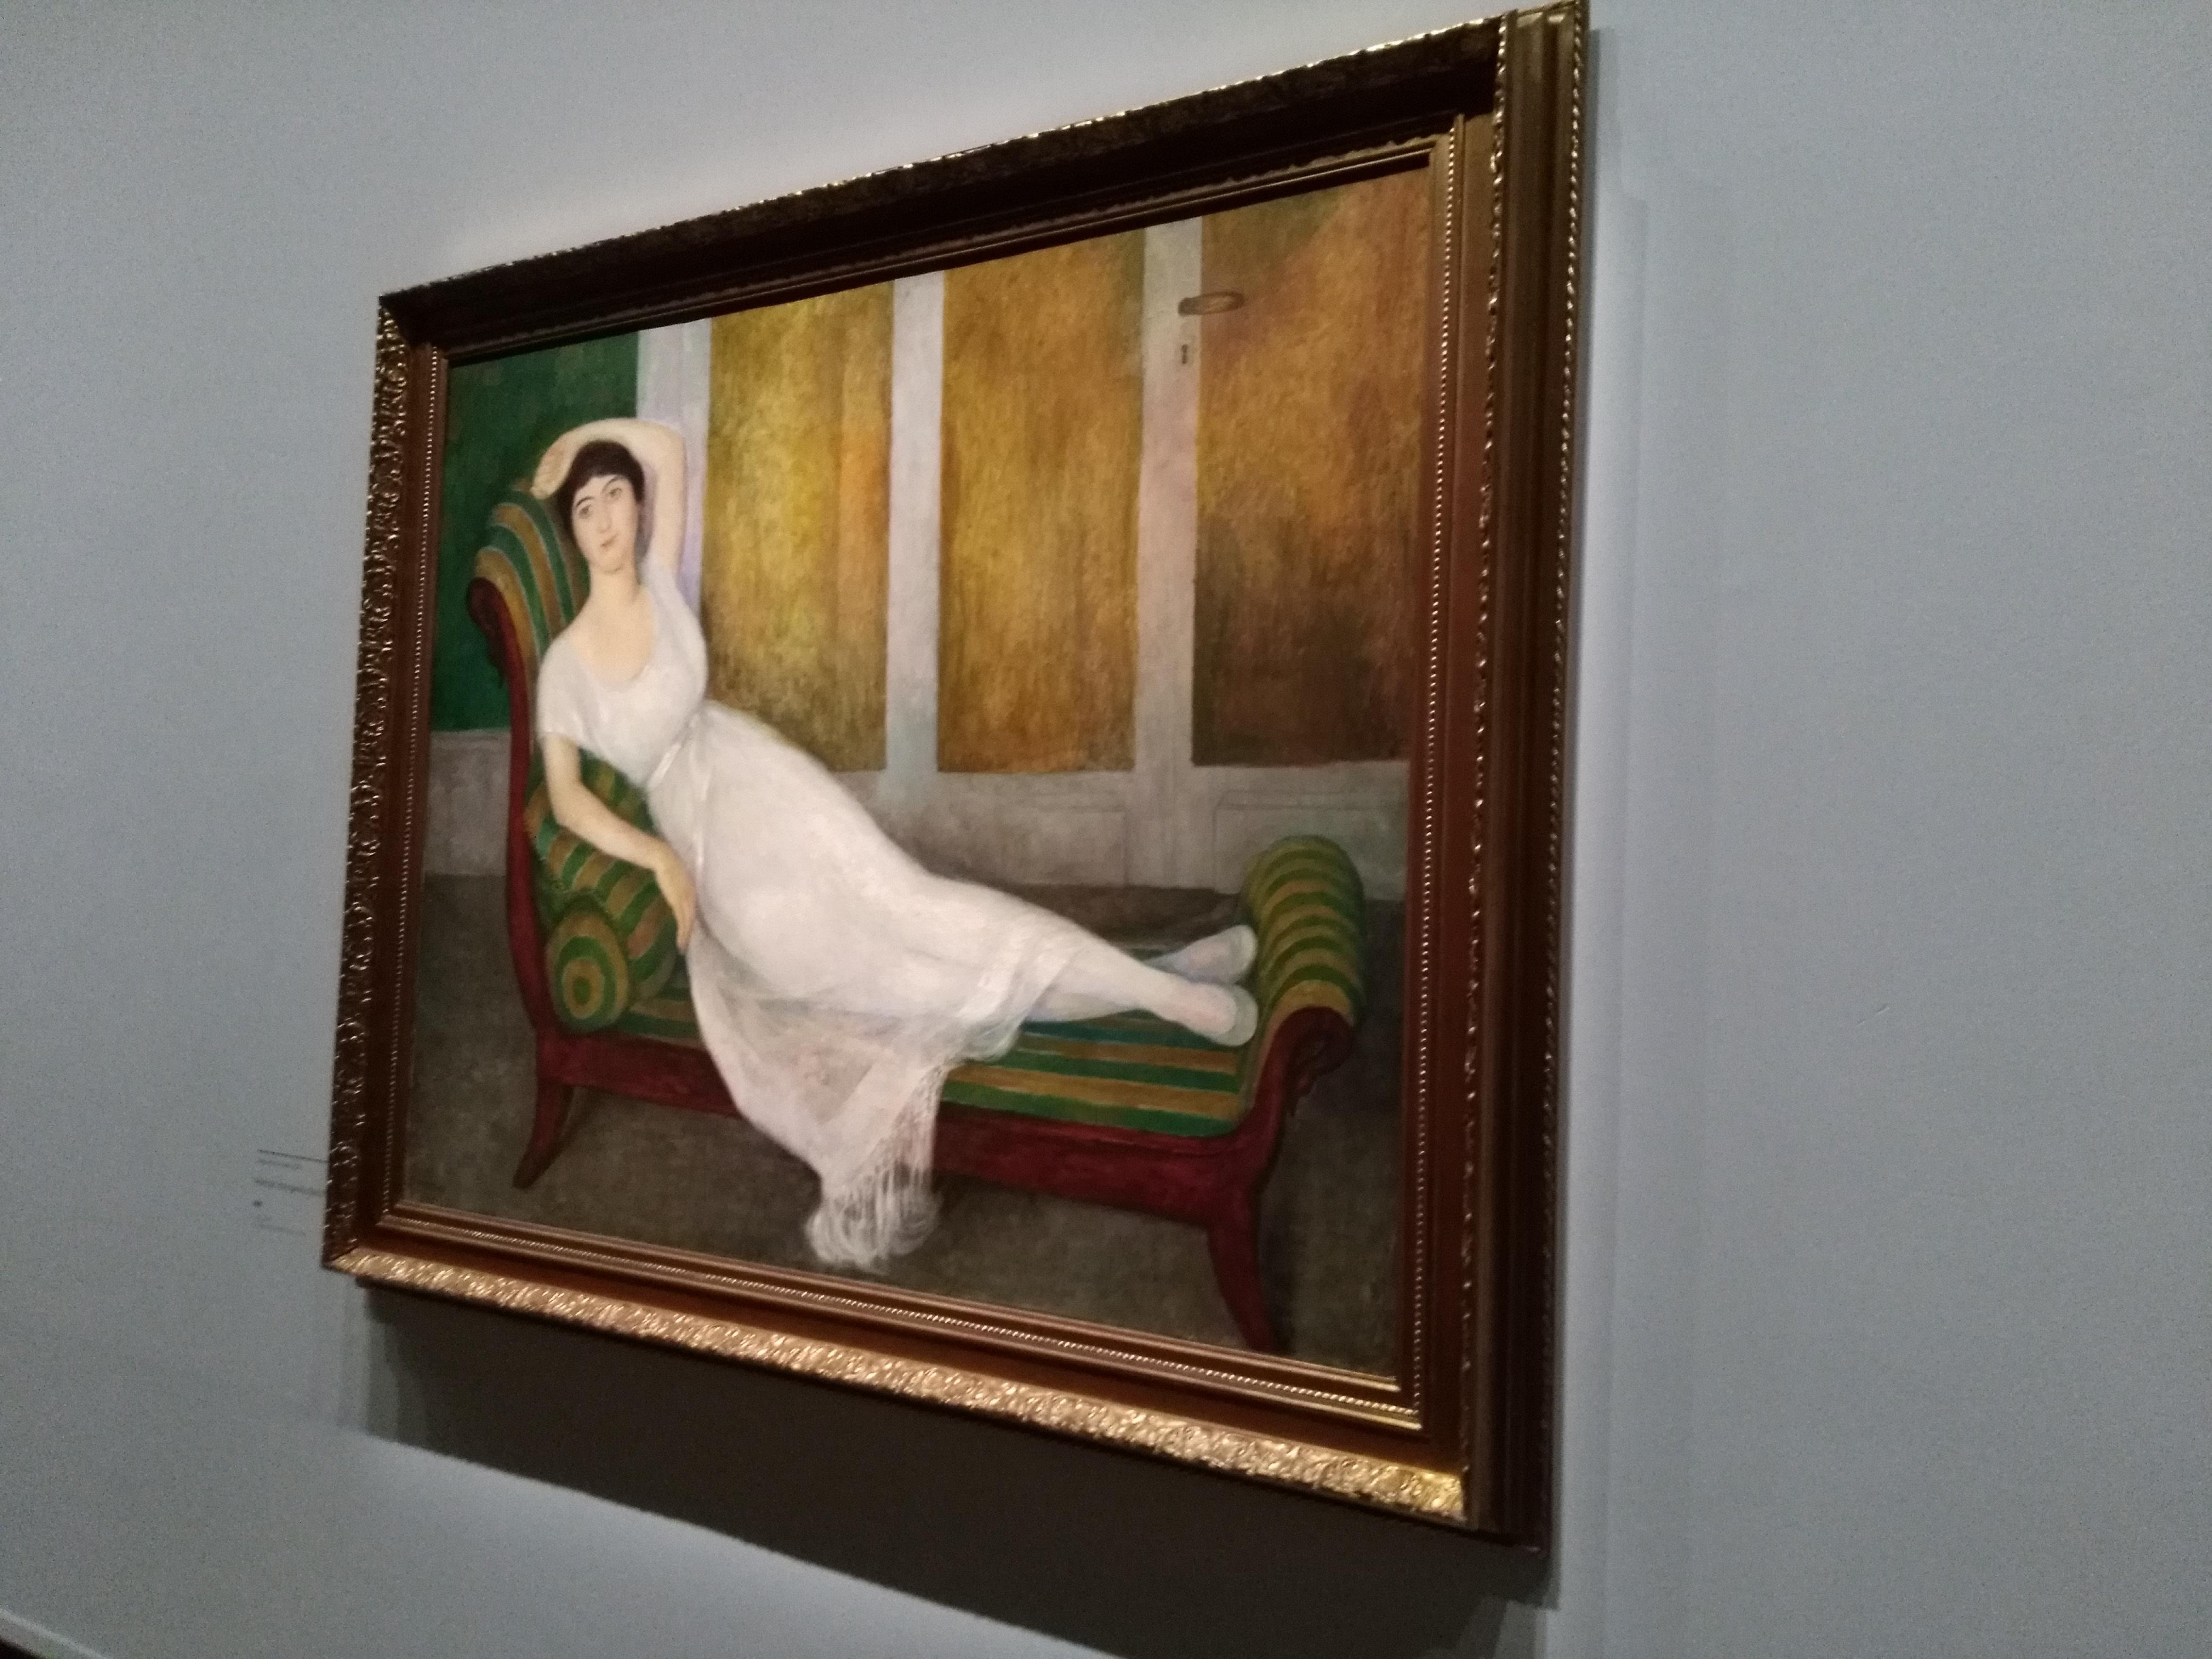 expo grand palais mexique 1900 1950 portrait angeline beloff diego rivera